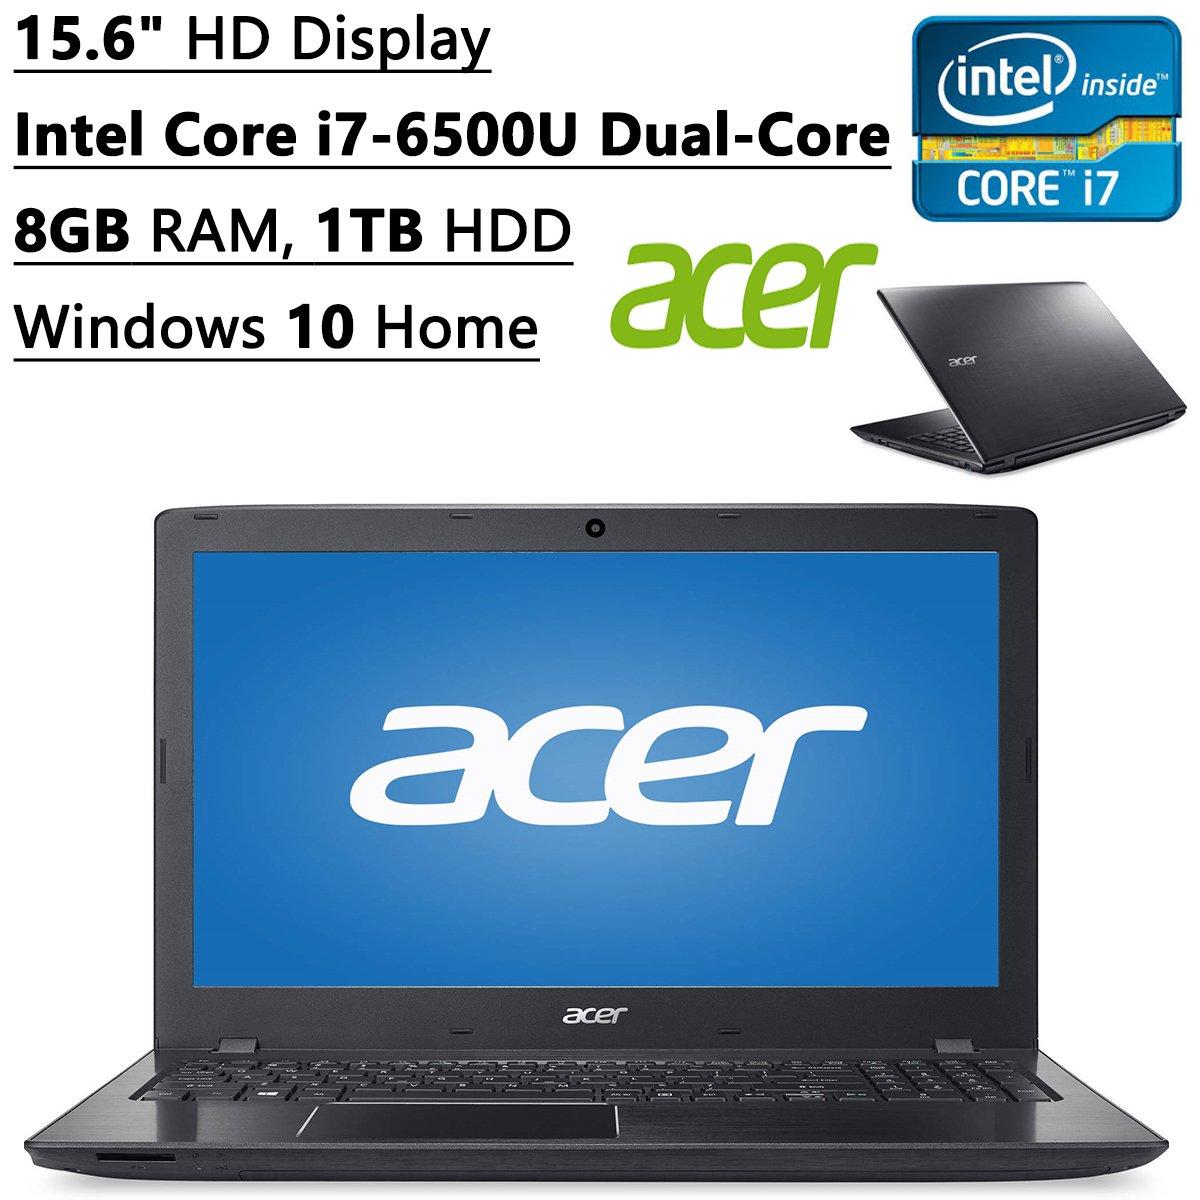 acer aspire 15 6 laptop intel core i7 6500u 8gb ram 1tb hdd dvdrw hdmi webcam ebay. Black Bedroom Furniture Sets. Home Design Ideas